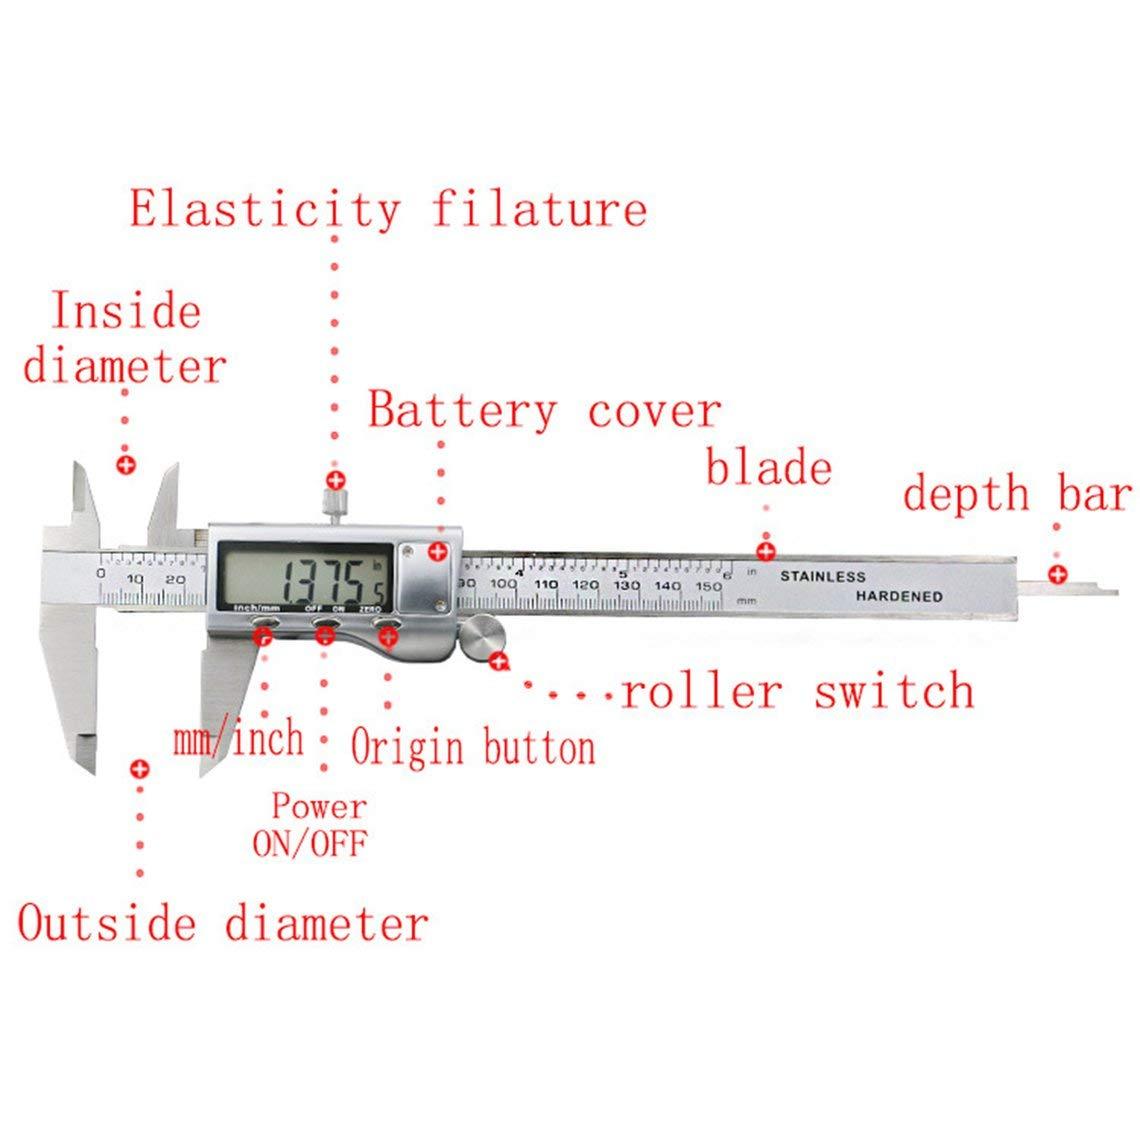 6inch Precisi/ón electr/ónica Digital Vernier Caliper Tool Gobernante Micr/ómetro de Acero Inoxidable Herramientas de medici/ón Gauge Zinniaya 150MM